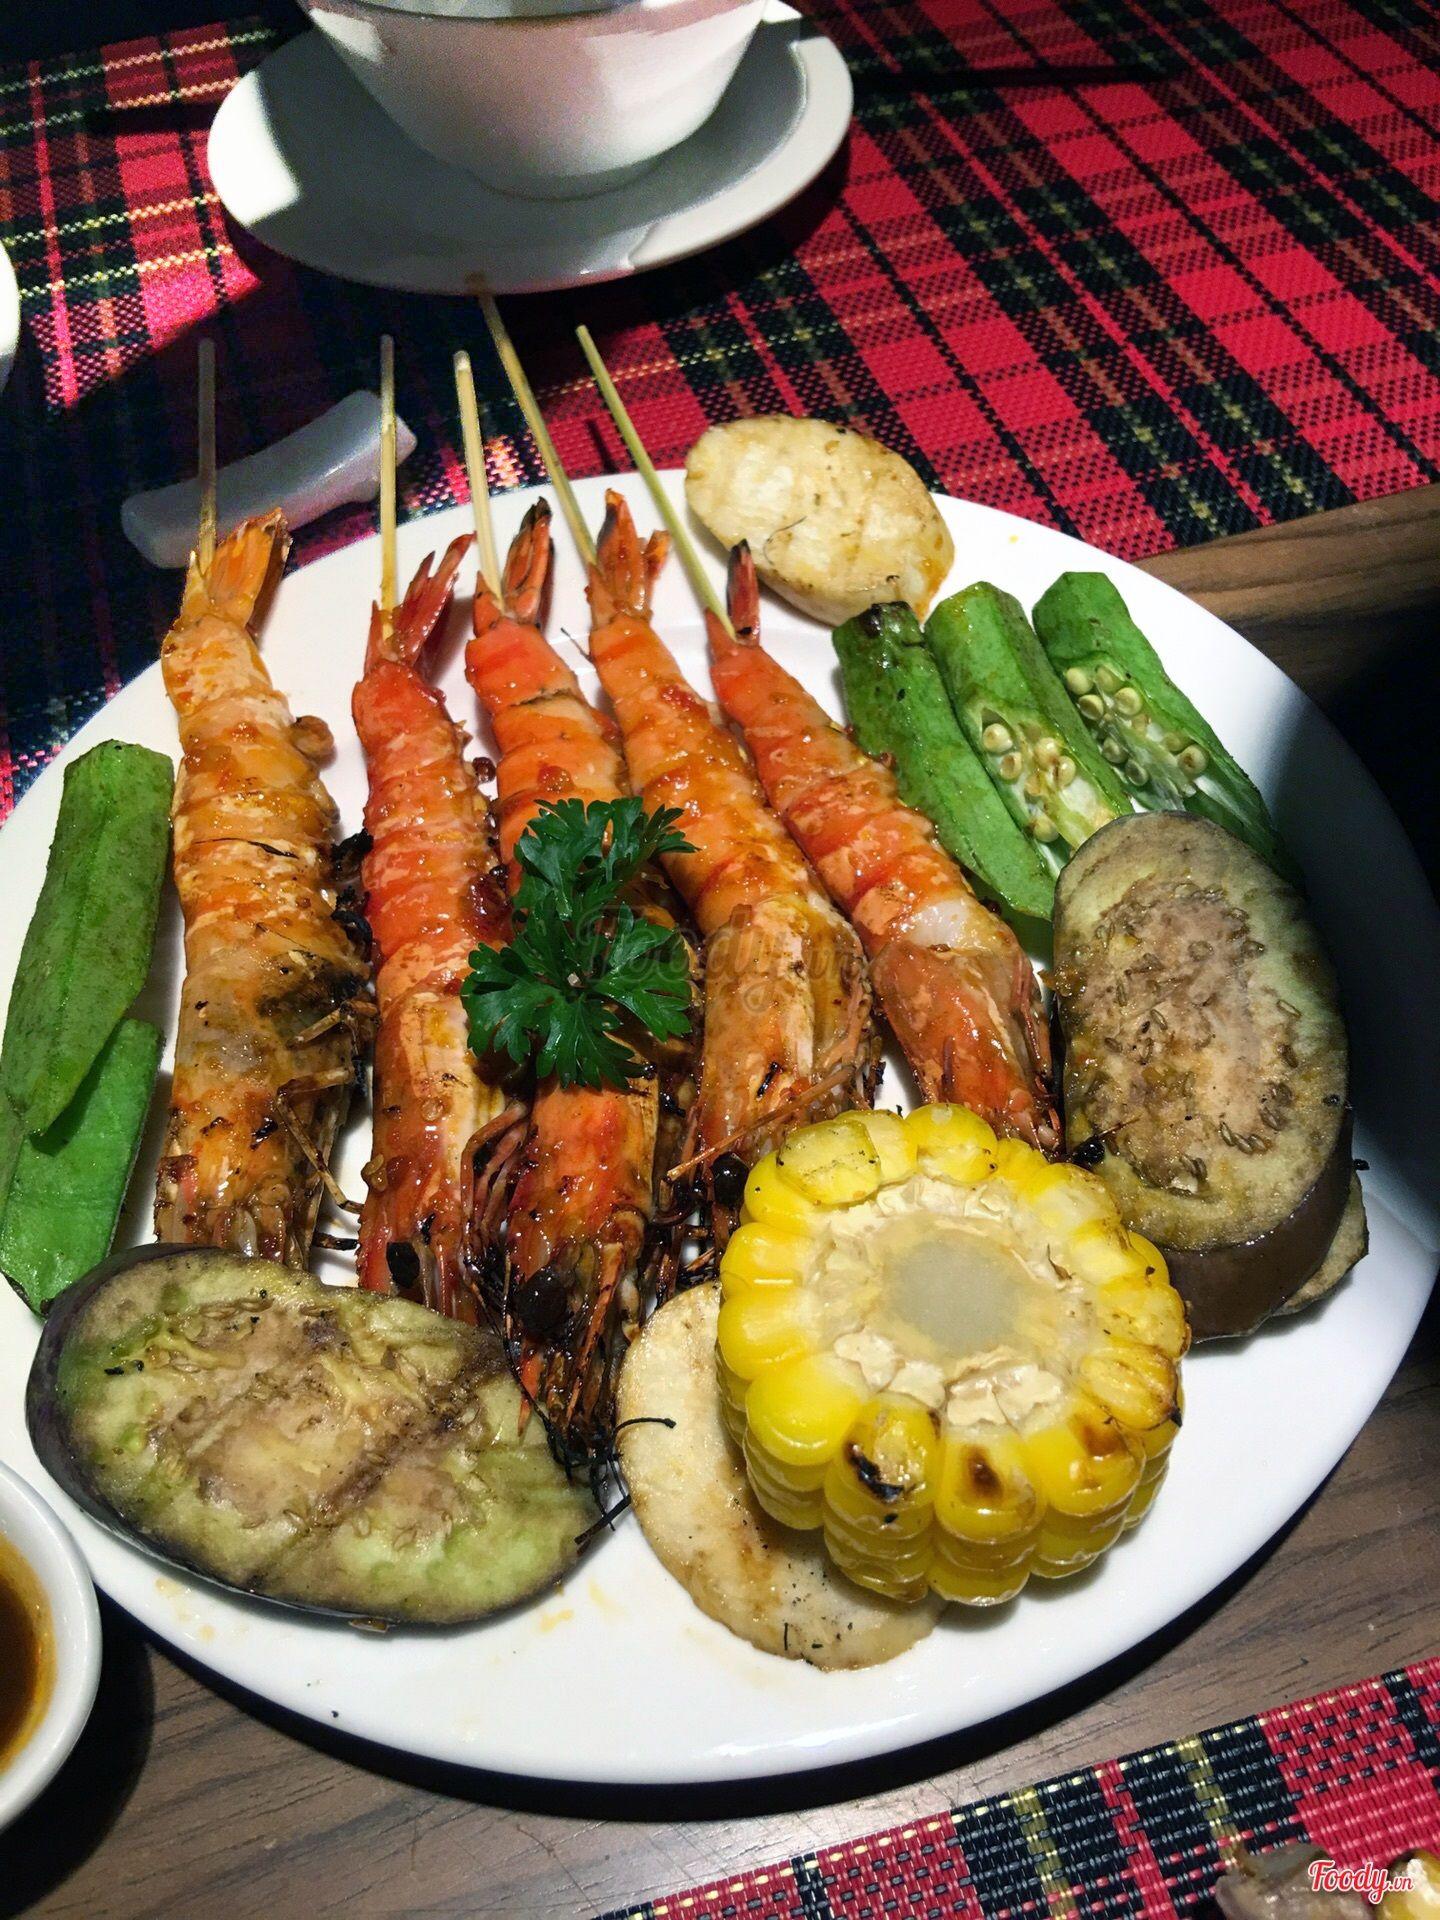 buffet-suon-no1-4